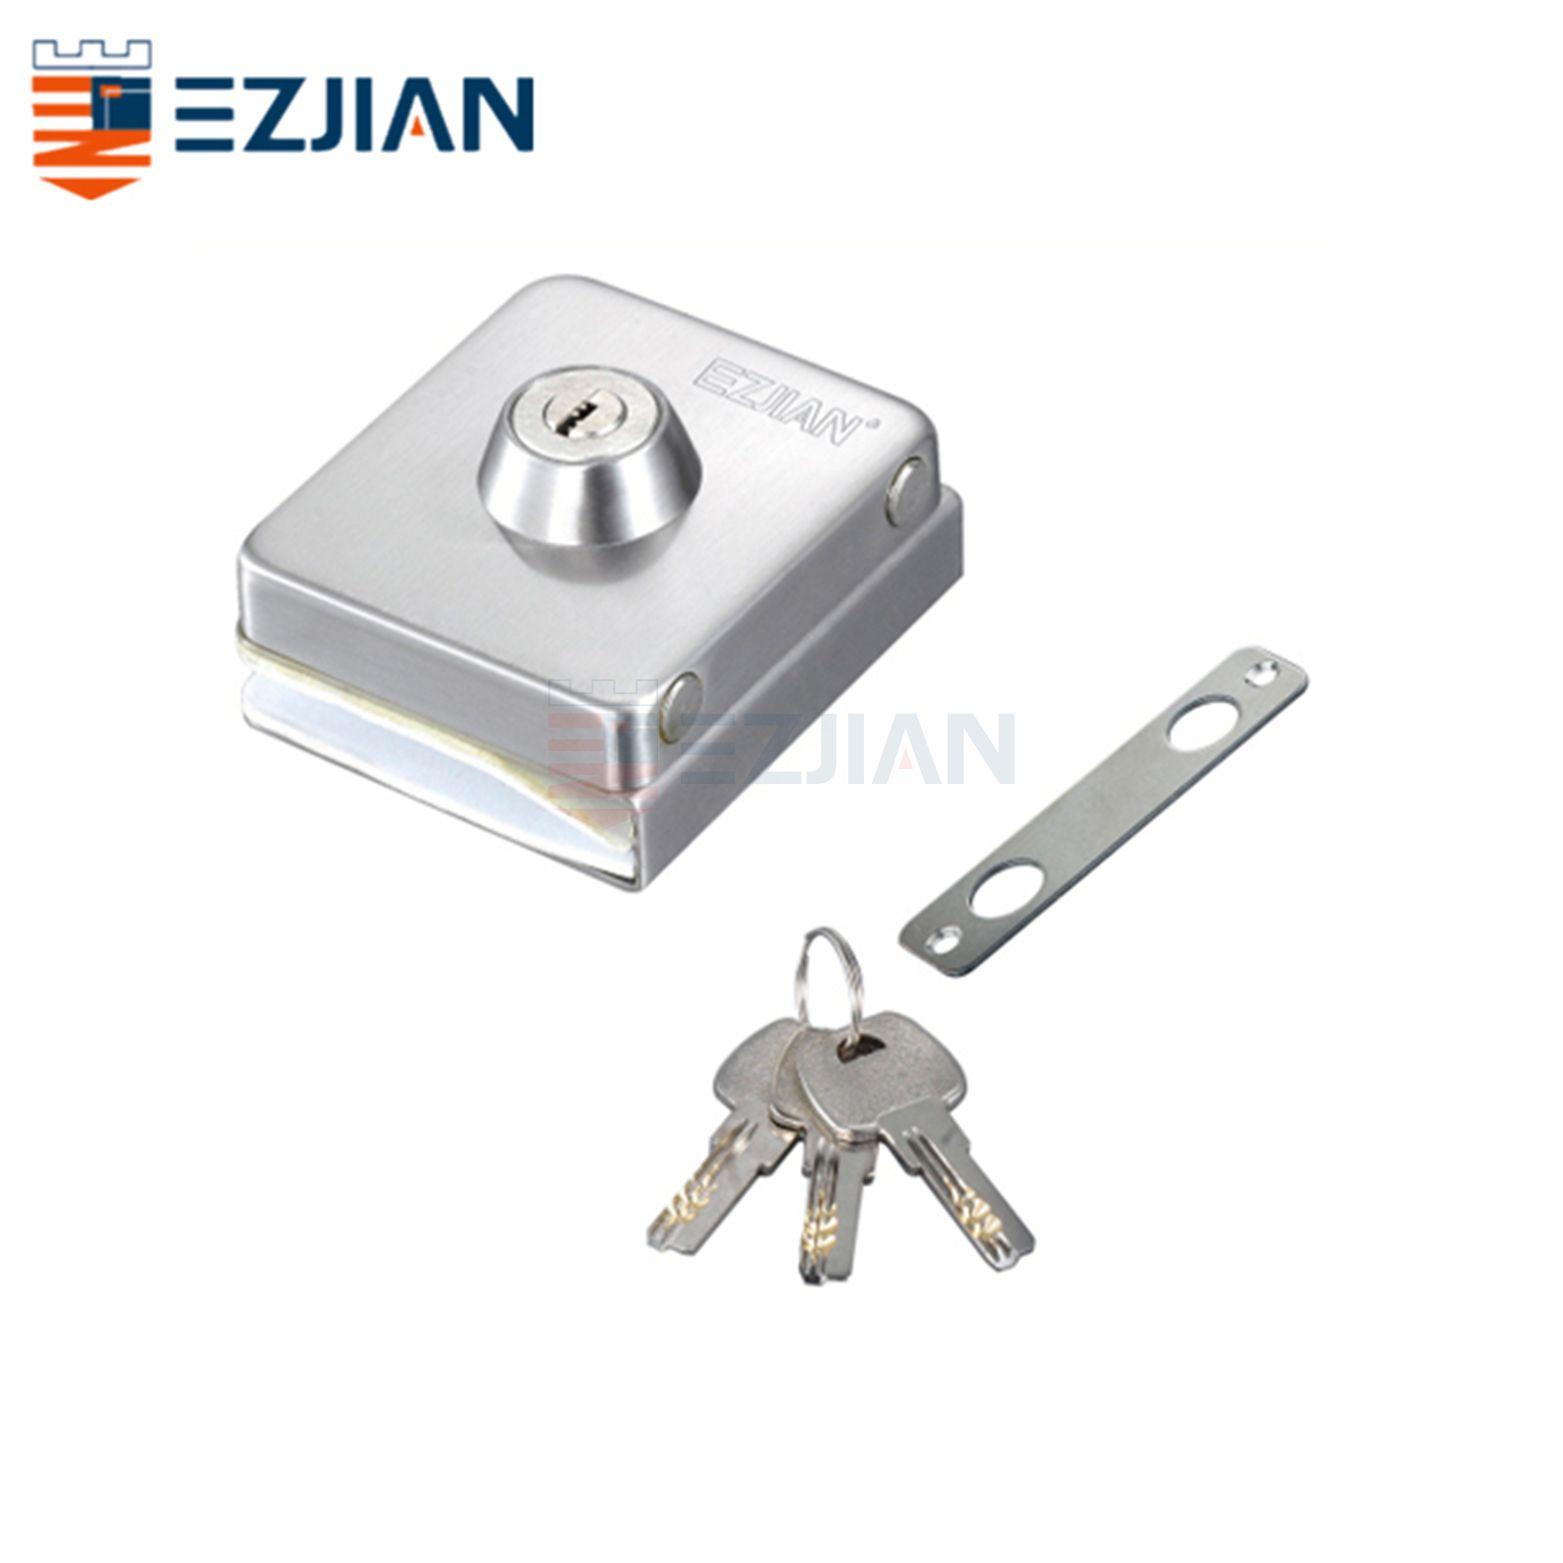 Glass Gate Lock EJ-9007